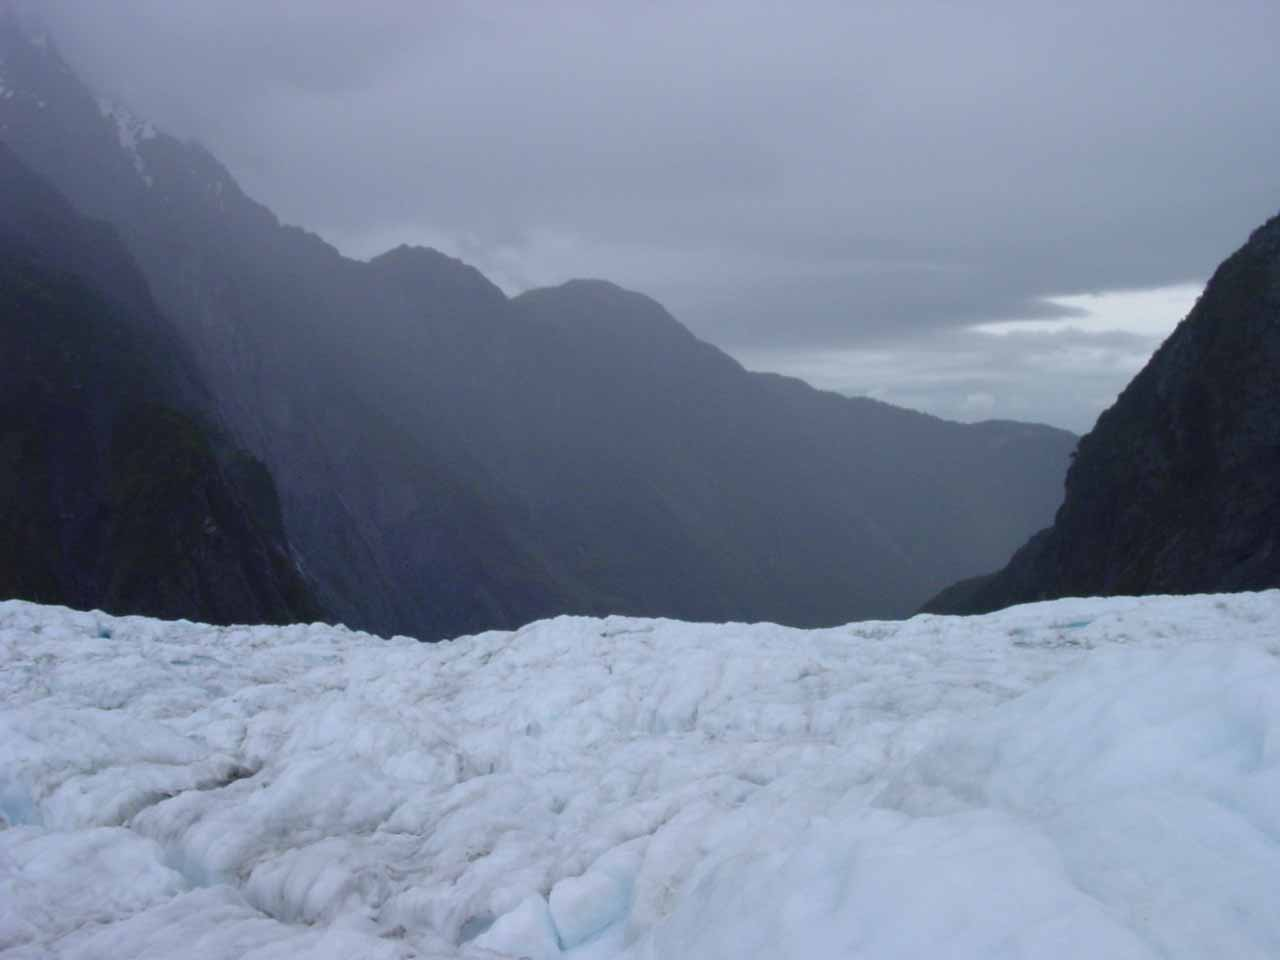 Looking downhill along the Franz Josef Glacier